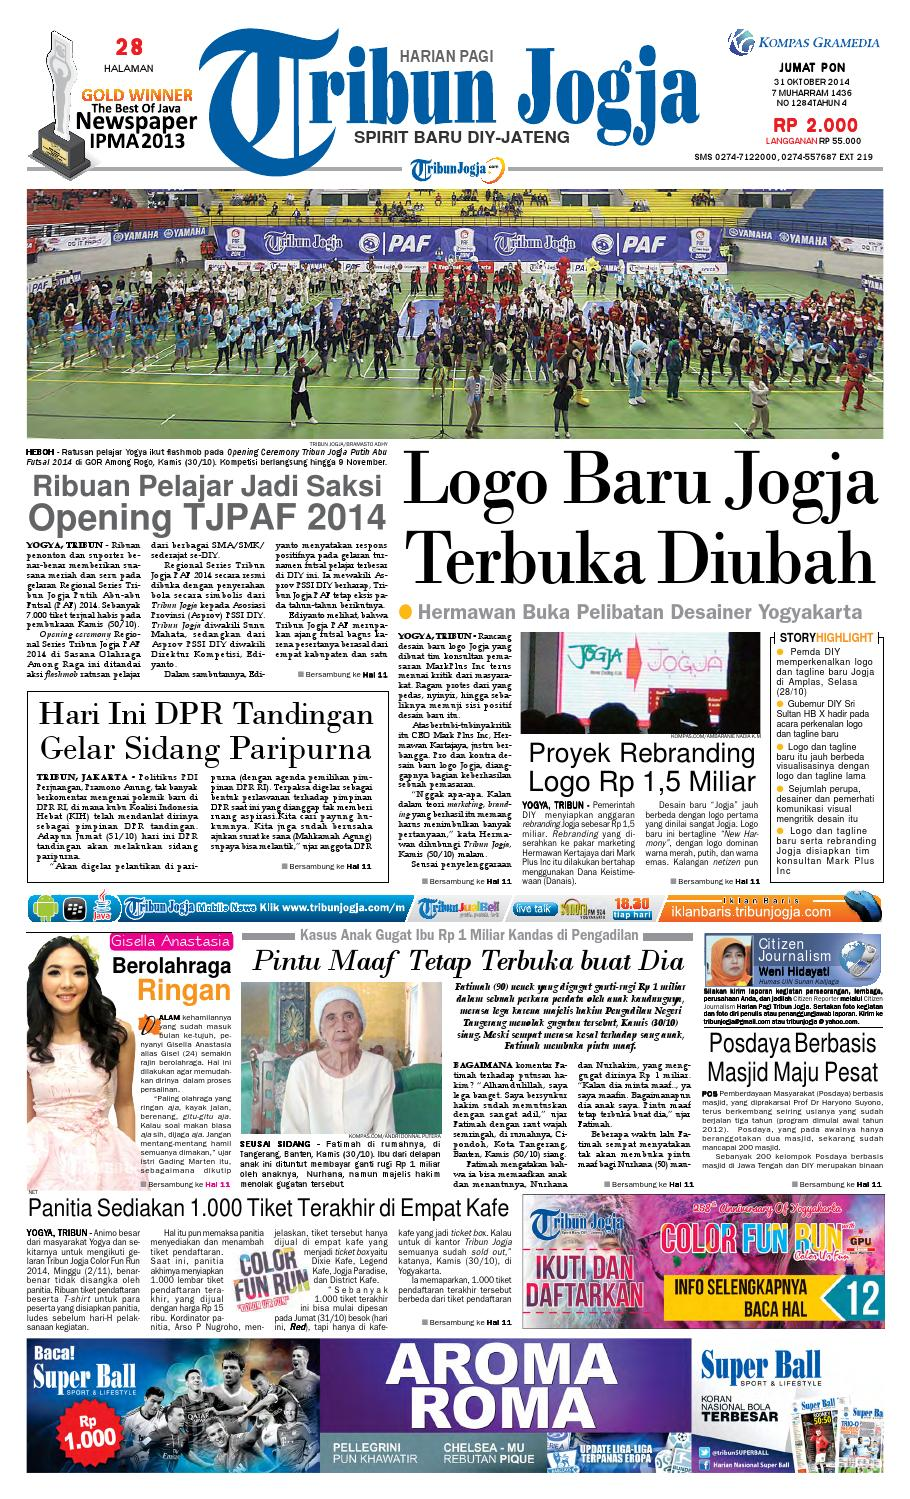 Tribunjogja 31 10 2014 By Tribun Jogja Issuu Produk Ukm Bumn Jamu Kunyit Asam Seger Waras